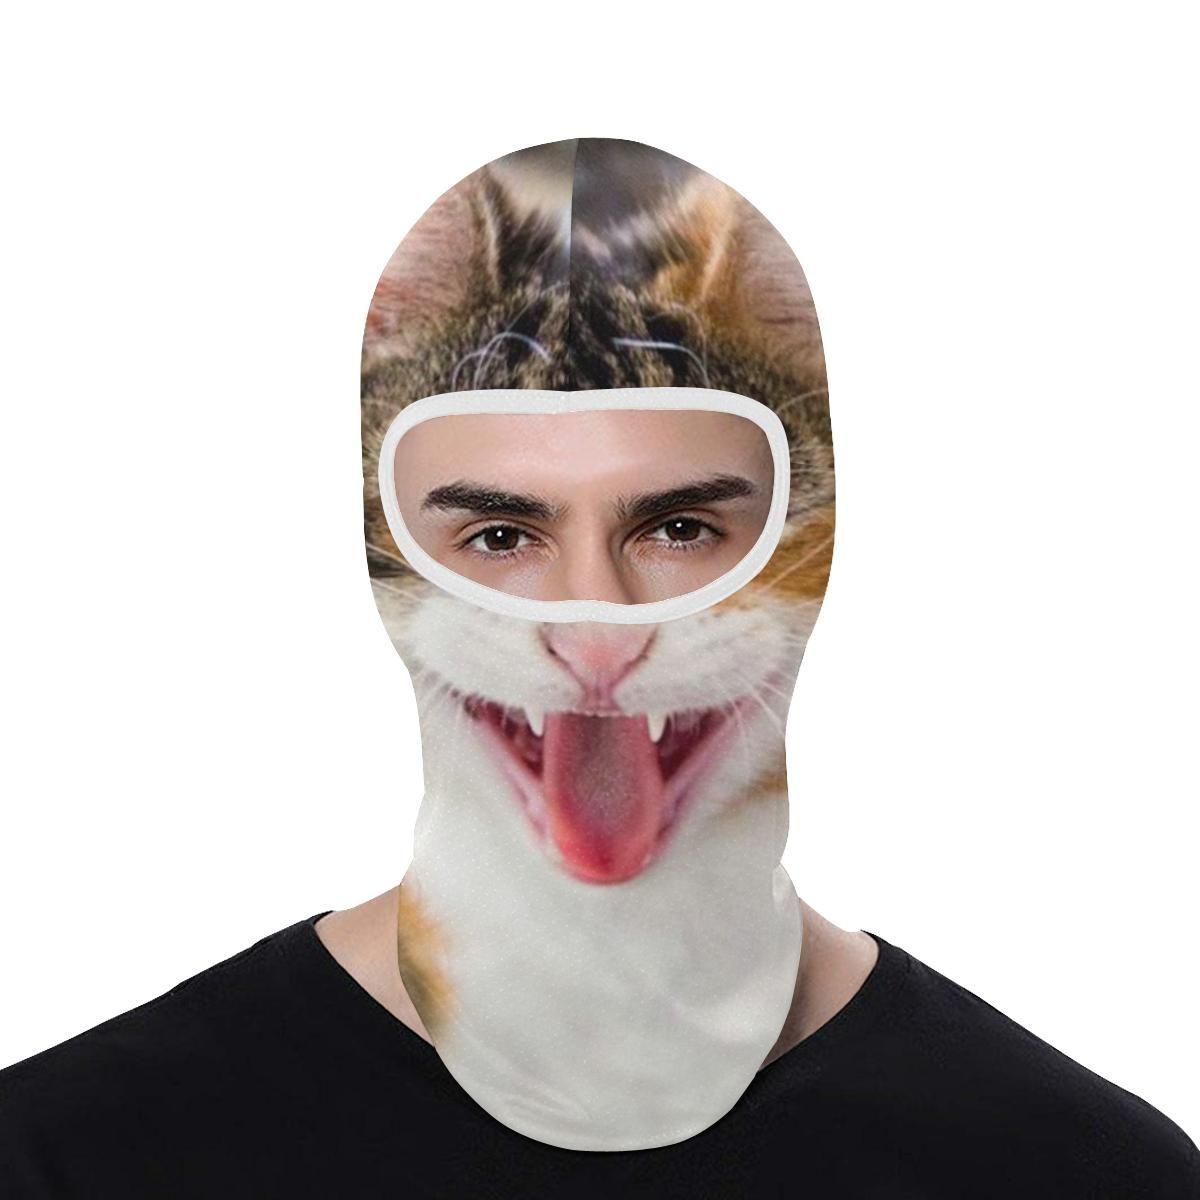 Cat Face Ski Mask Balaclava Cat Tongue Out Yawning Full Face Mask Ecatshop Cat Face Full Face Mask Cat Yawning